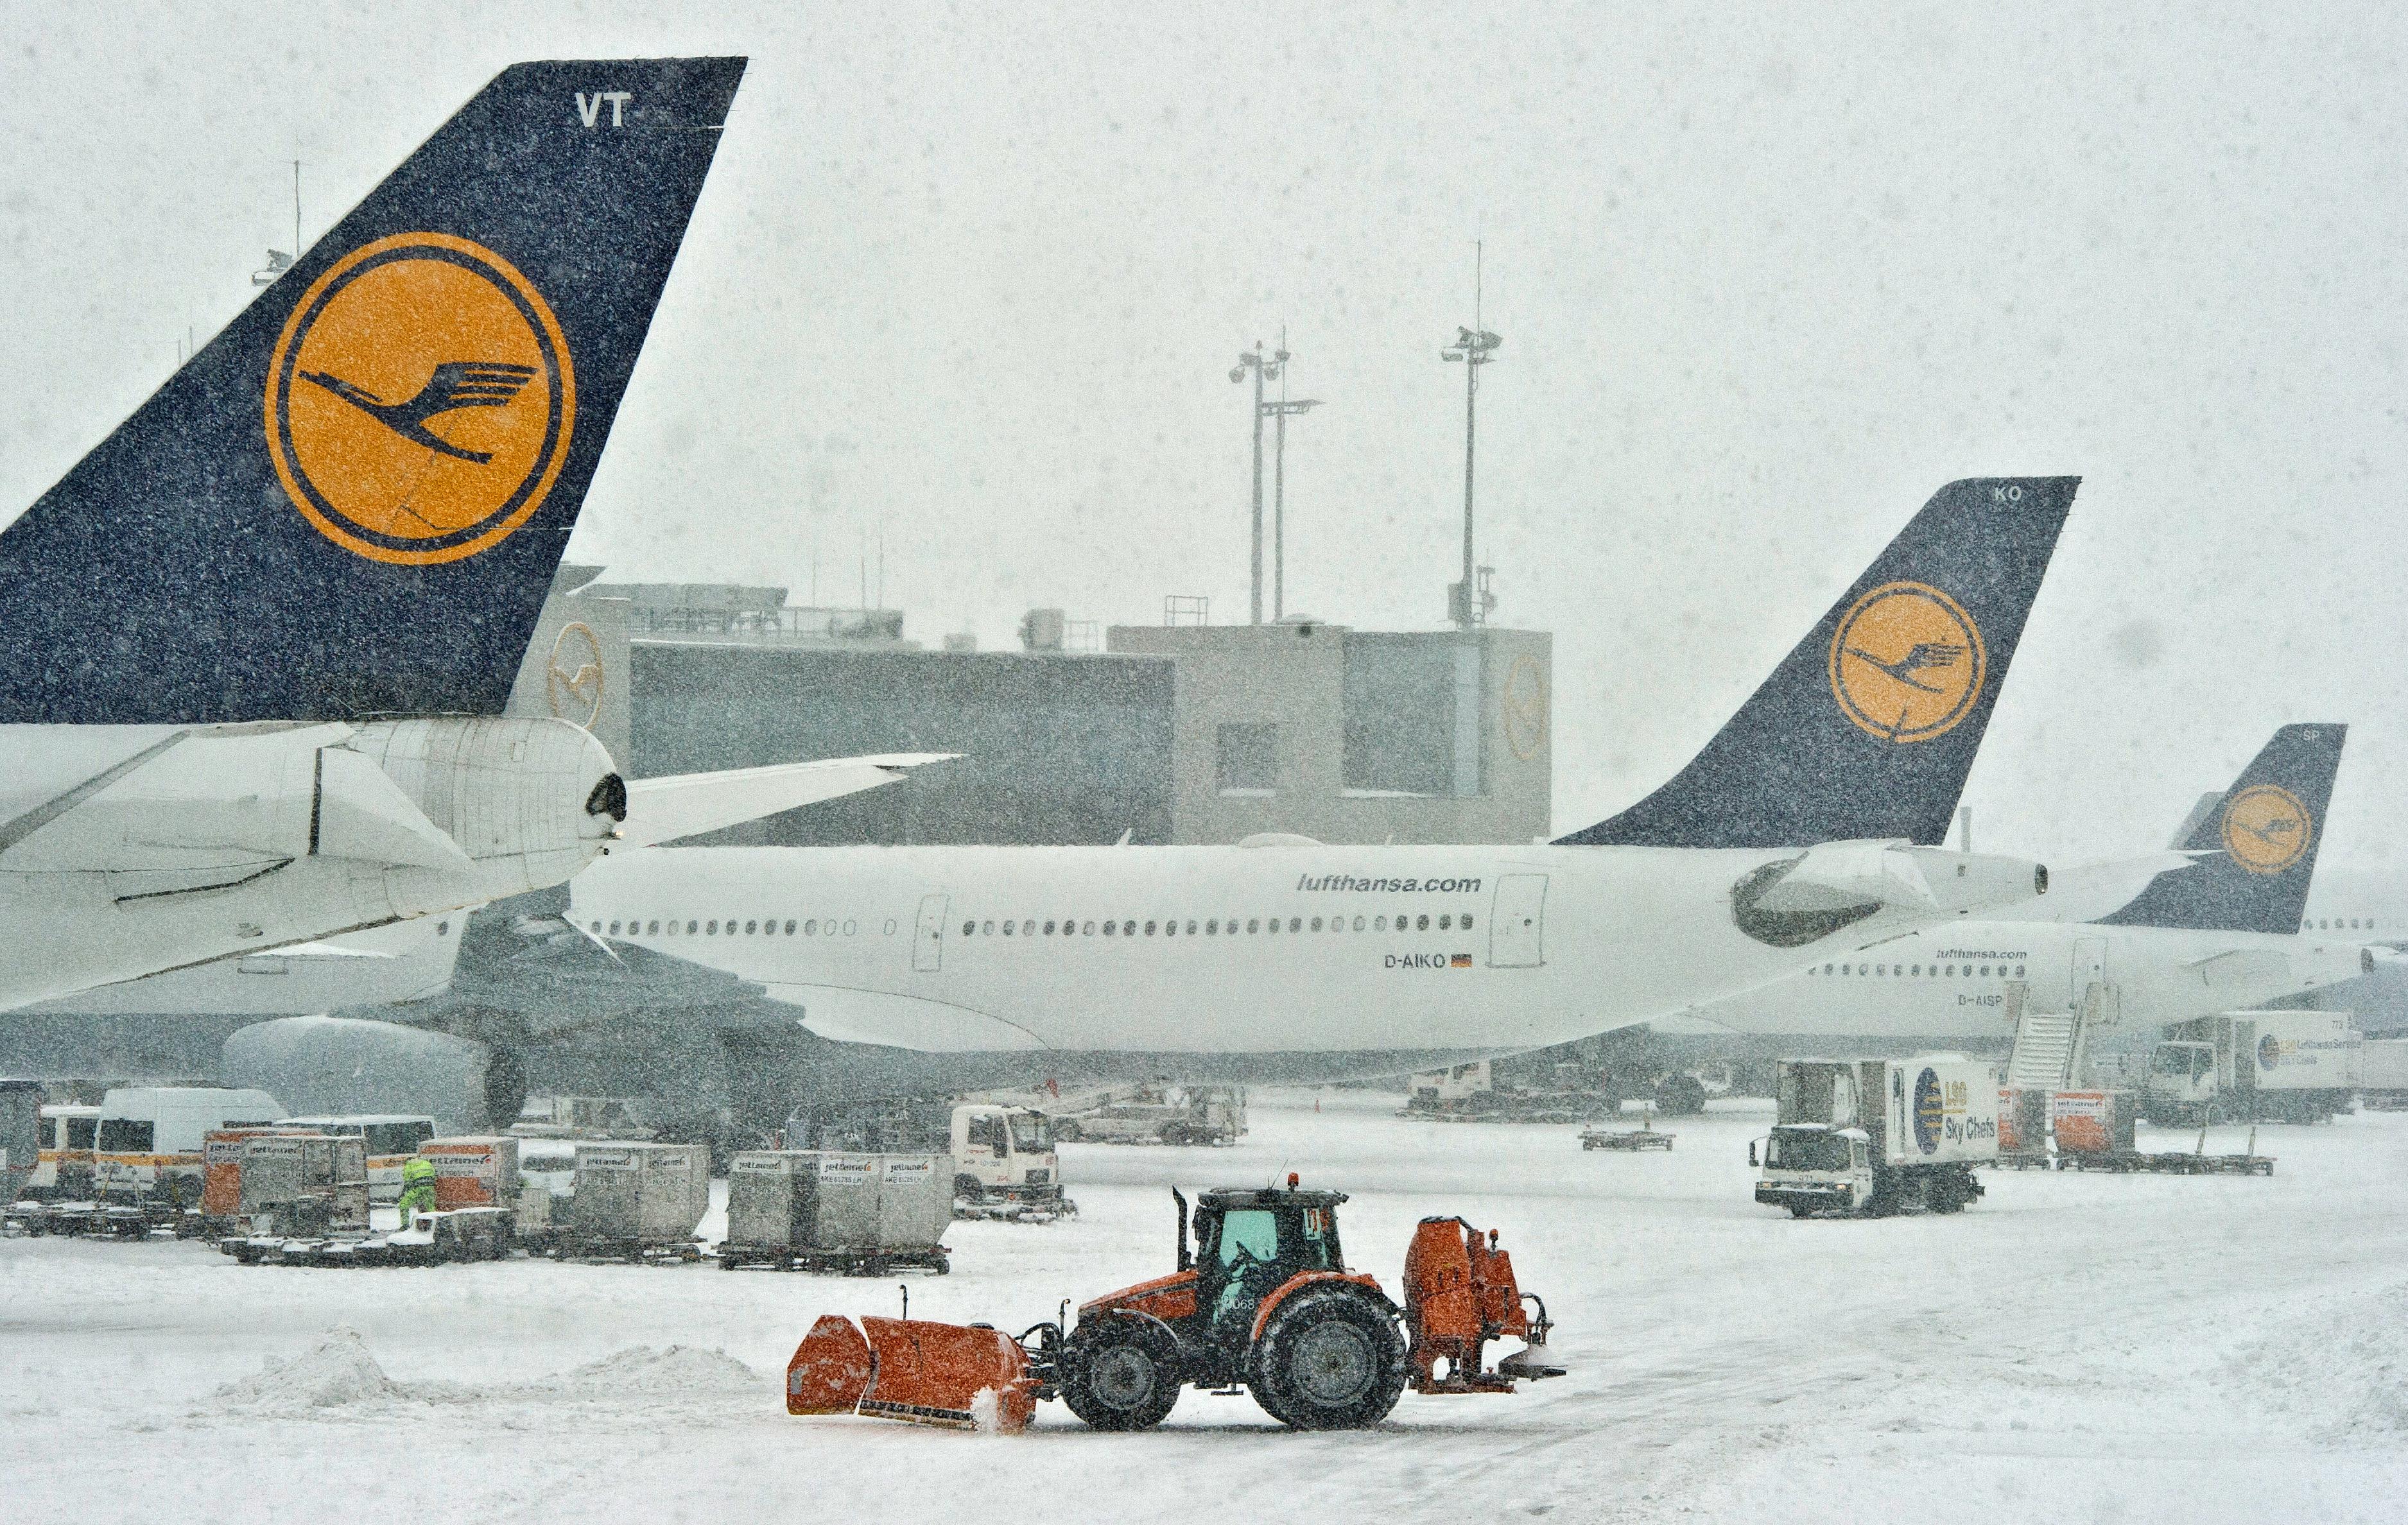 germany frankfurt airport shut down amid heavy snowfall